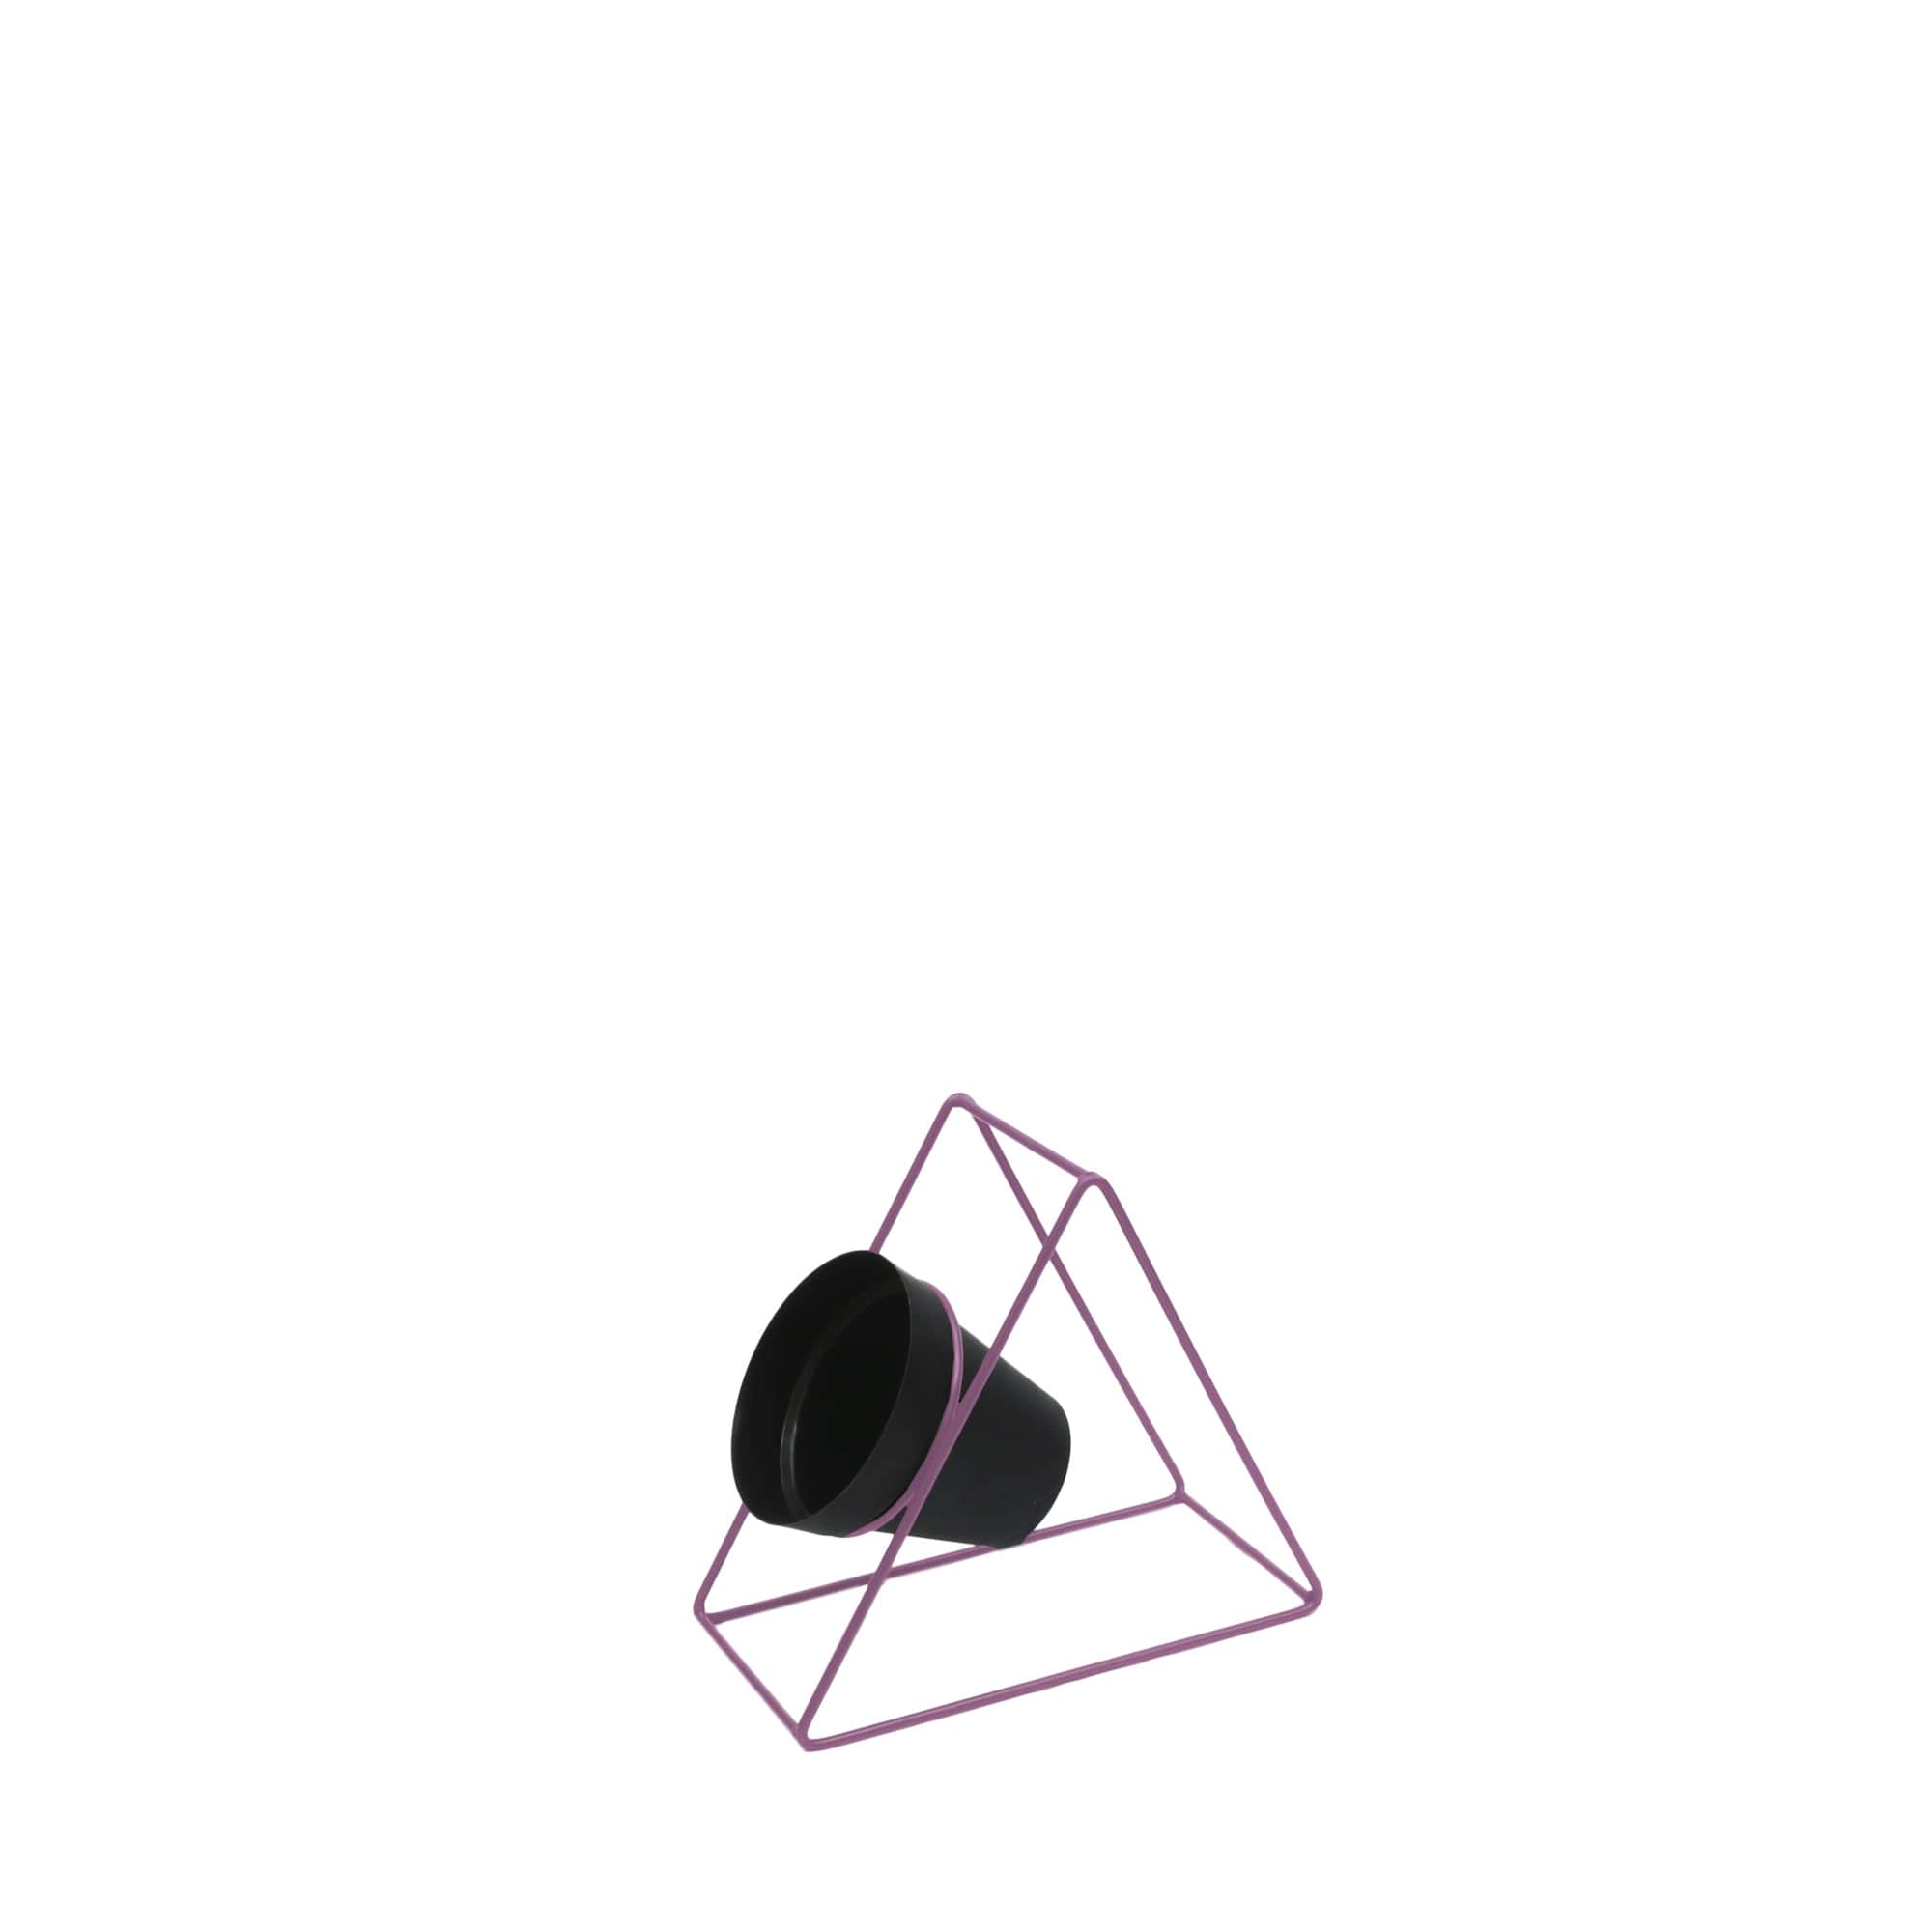 Suporte Ferro Triângulo Parede 24 x 24 cm Rosa Vasart